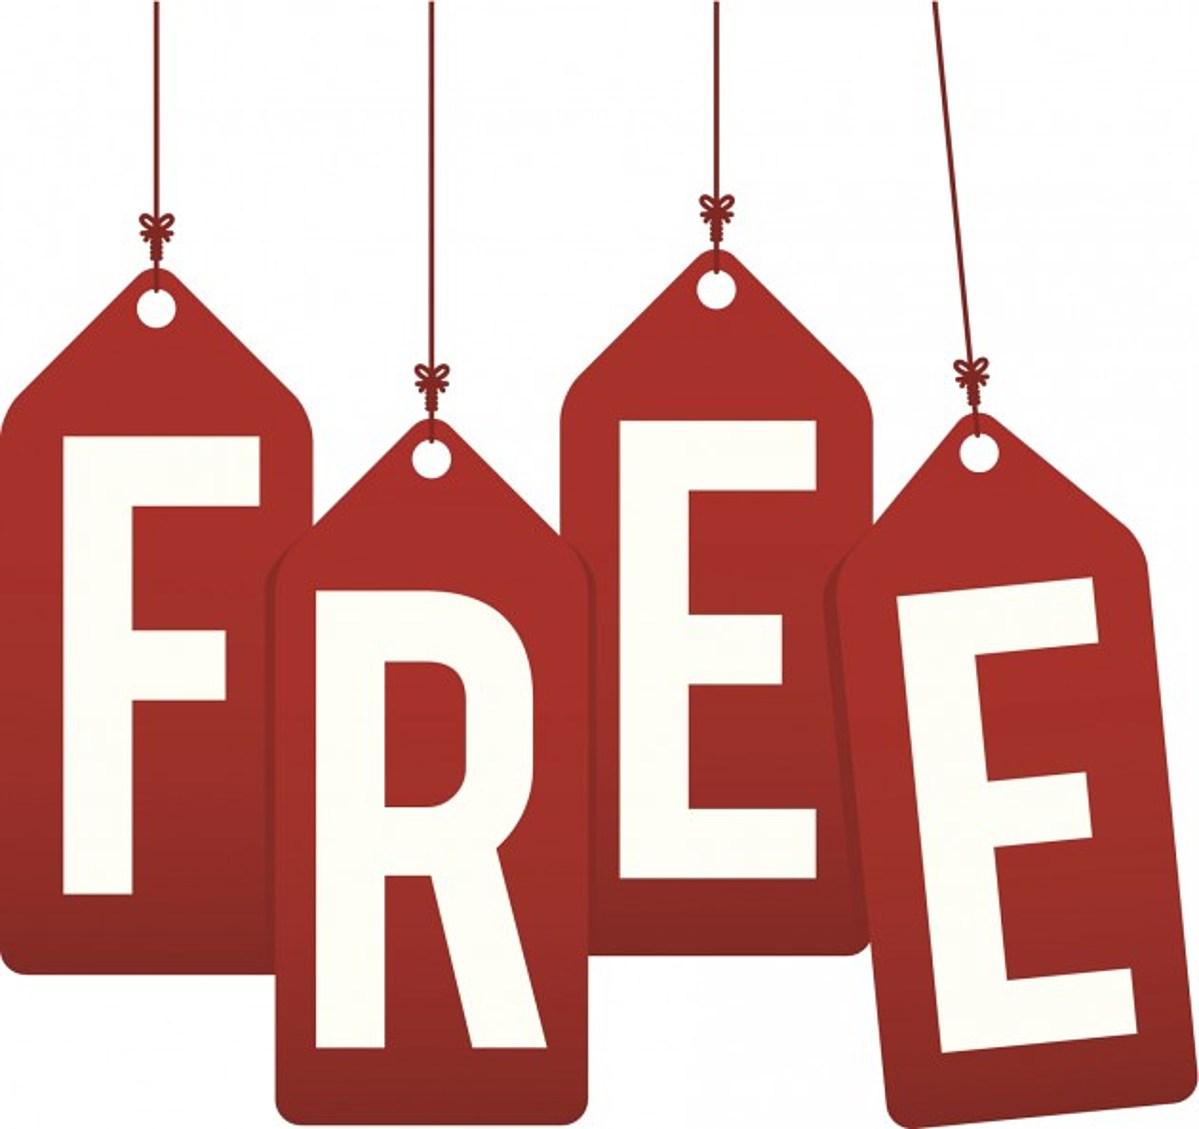 10 Cool FREE Things on Western Slope Craigslist